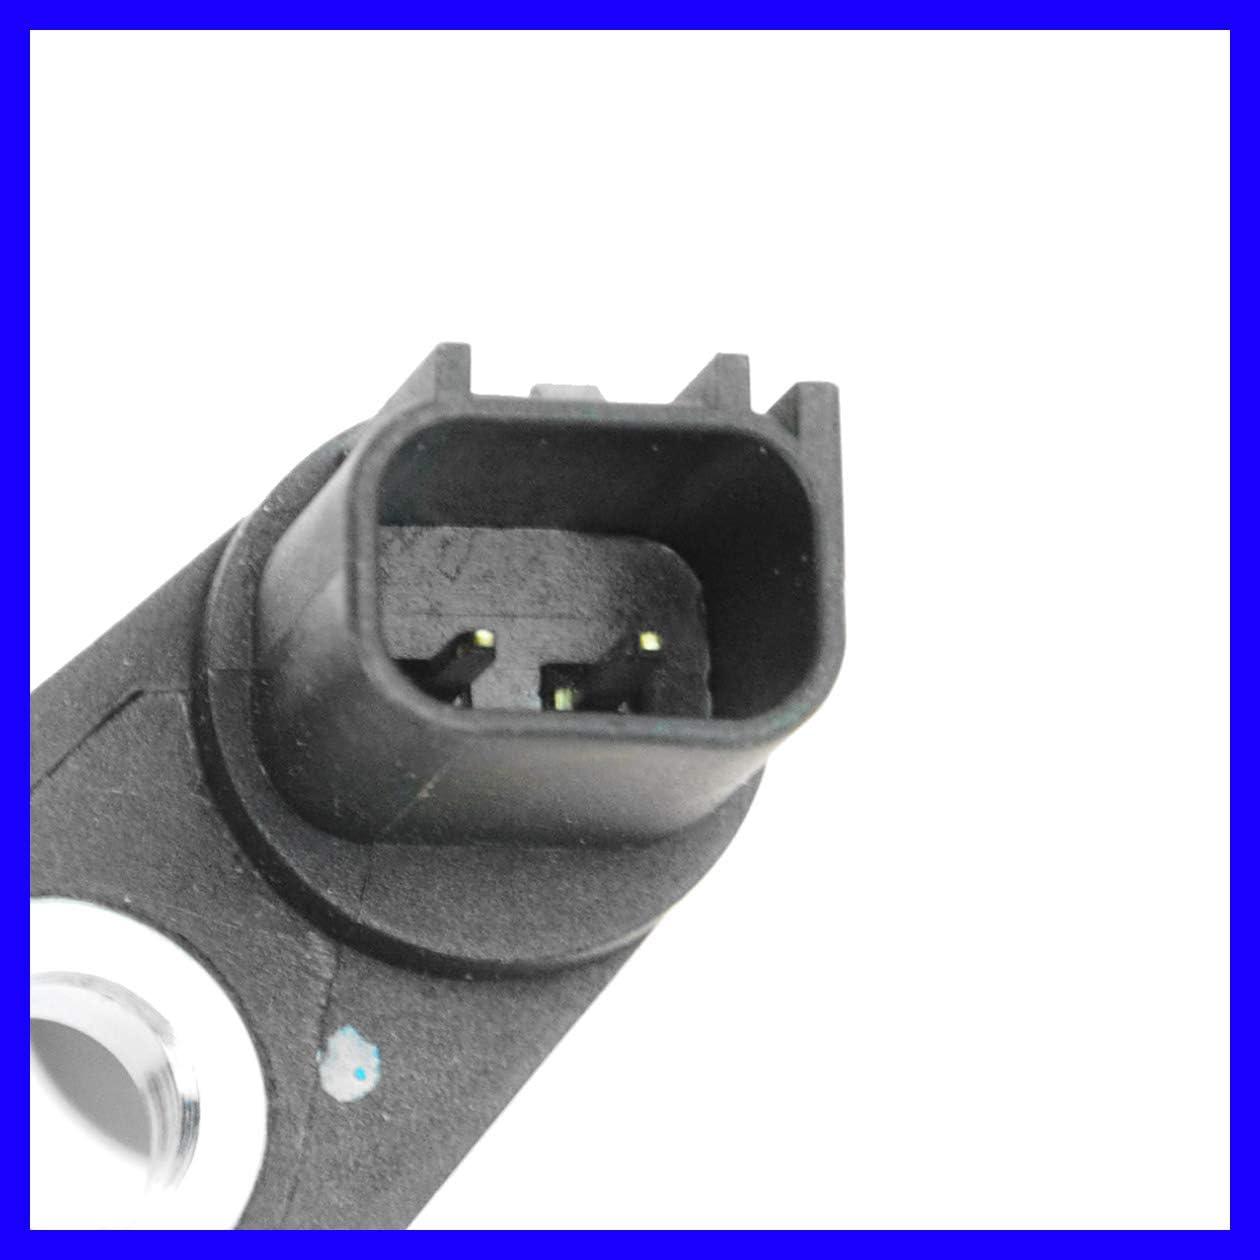 Camshaft Position Sensor for Ford Jaguar Lincoln Mercury 3.0 4.6 5.4 6.8